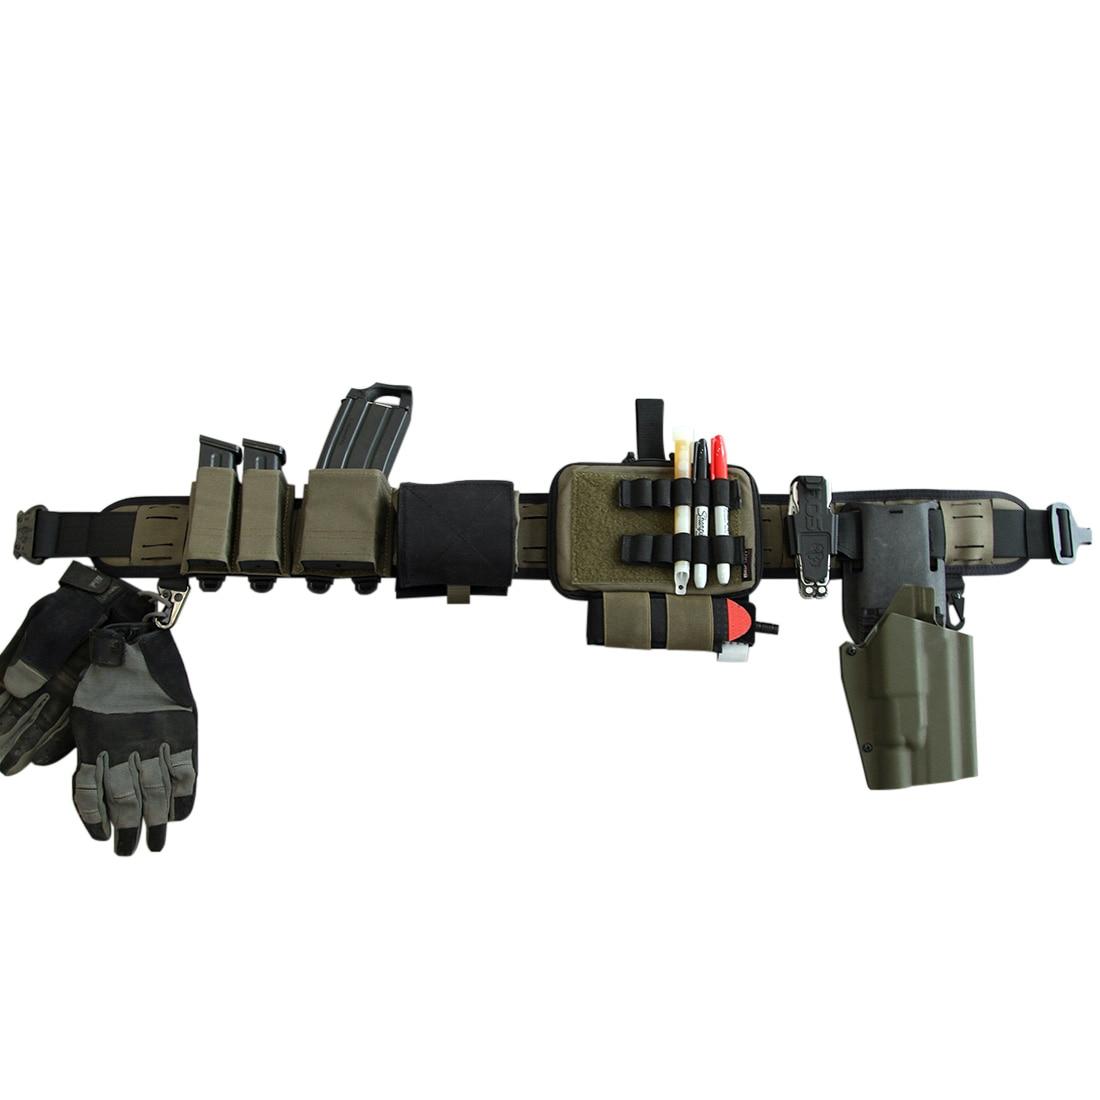 Bigfoot Orion 4.0 Tactical Belt Outdoor Combat Battle Belt Adjustable Military Waistband Set for Airsoft Tactical Loadout